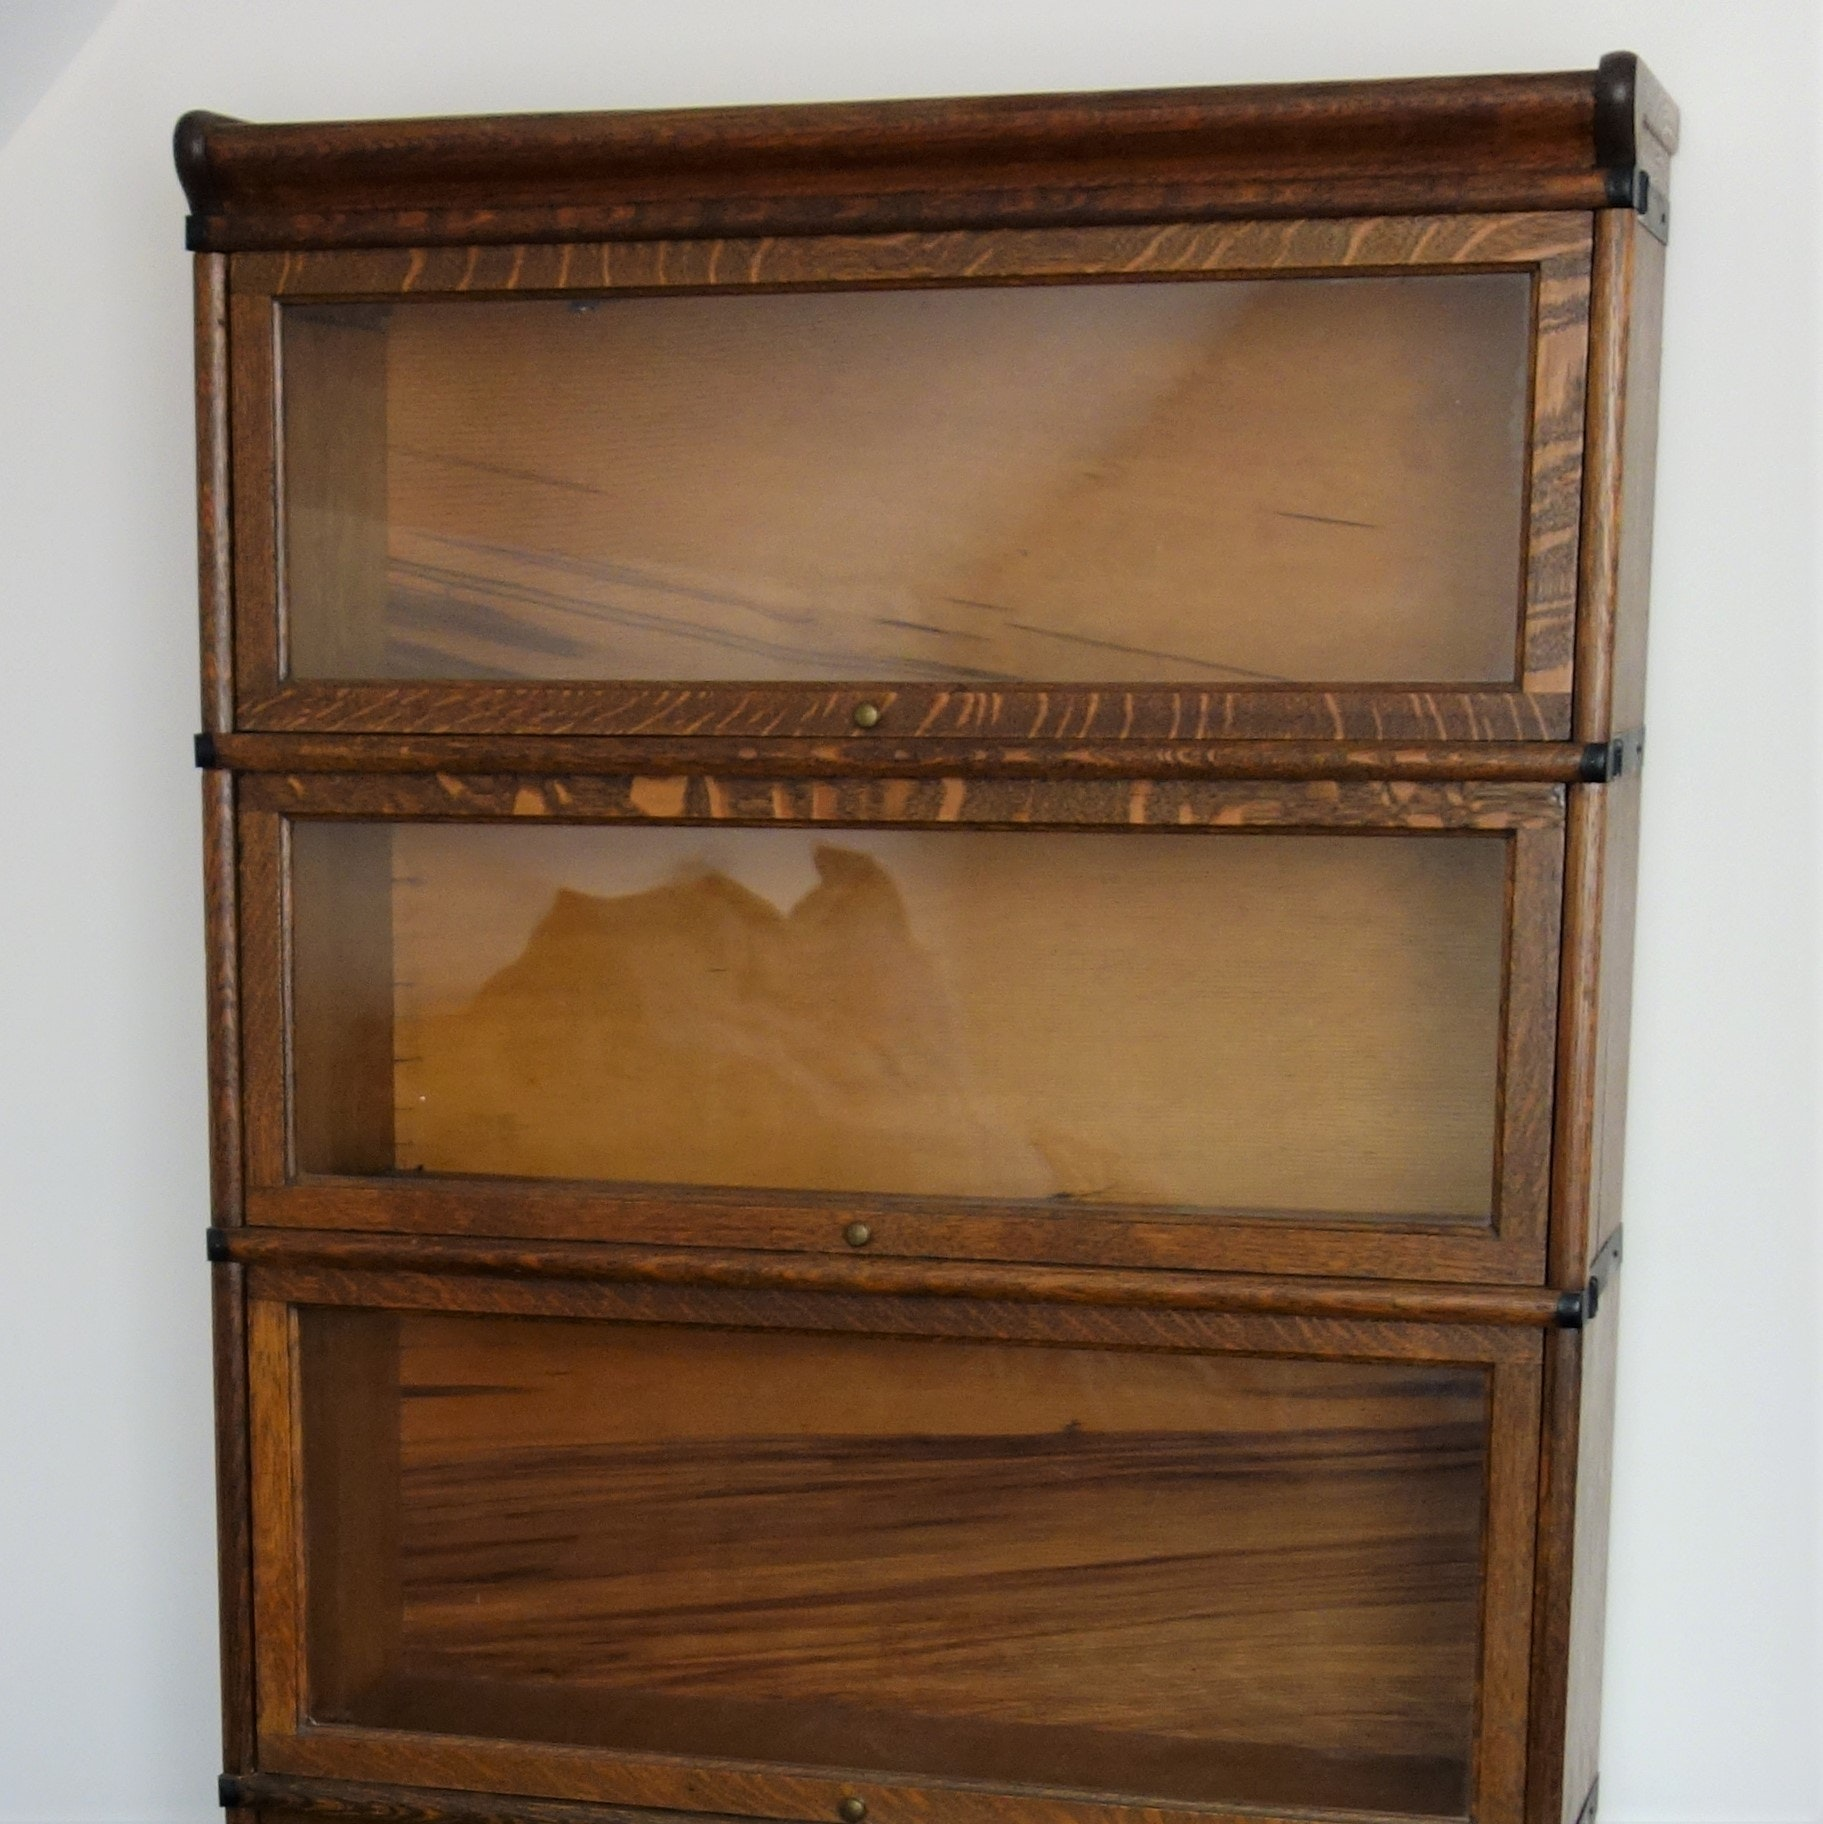 Globe-Wernicke Barrister's Bookcase